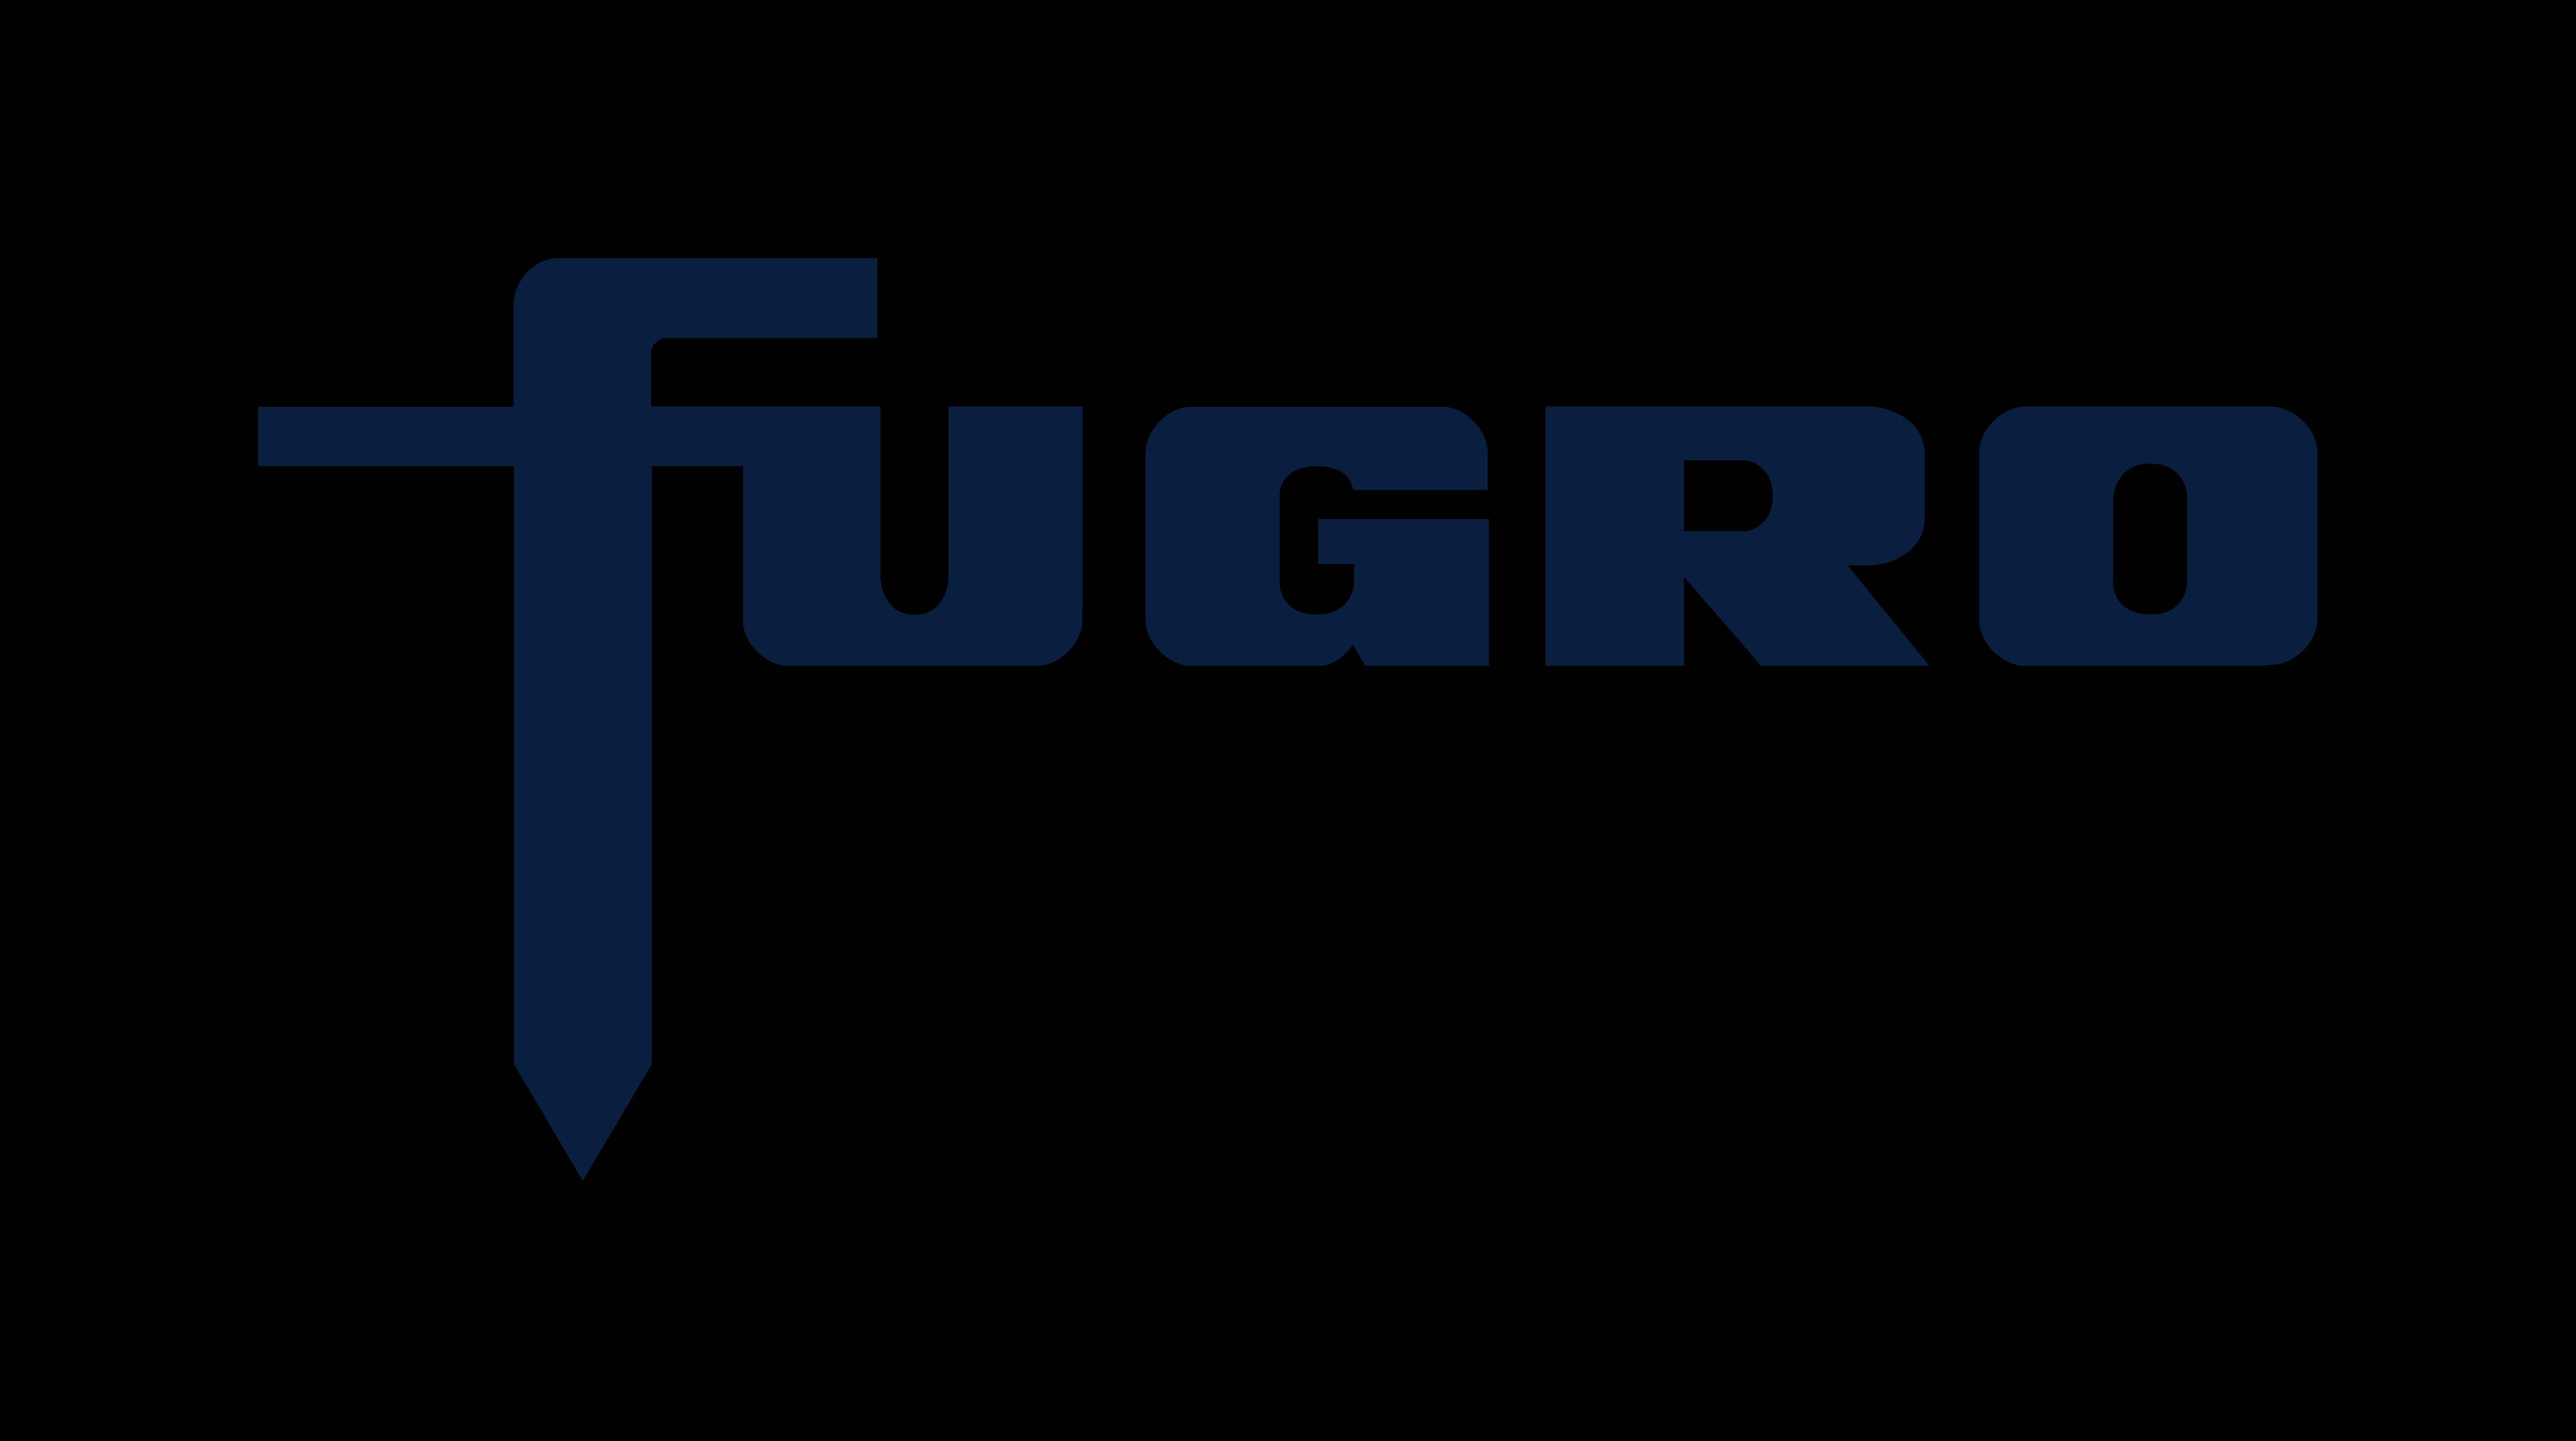 Логотип Департамента технологий округа Сакраменто